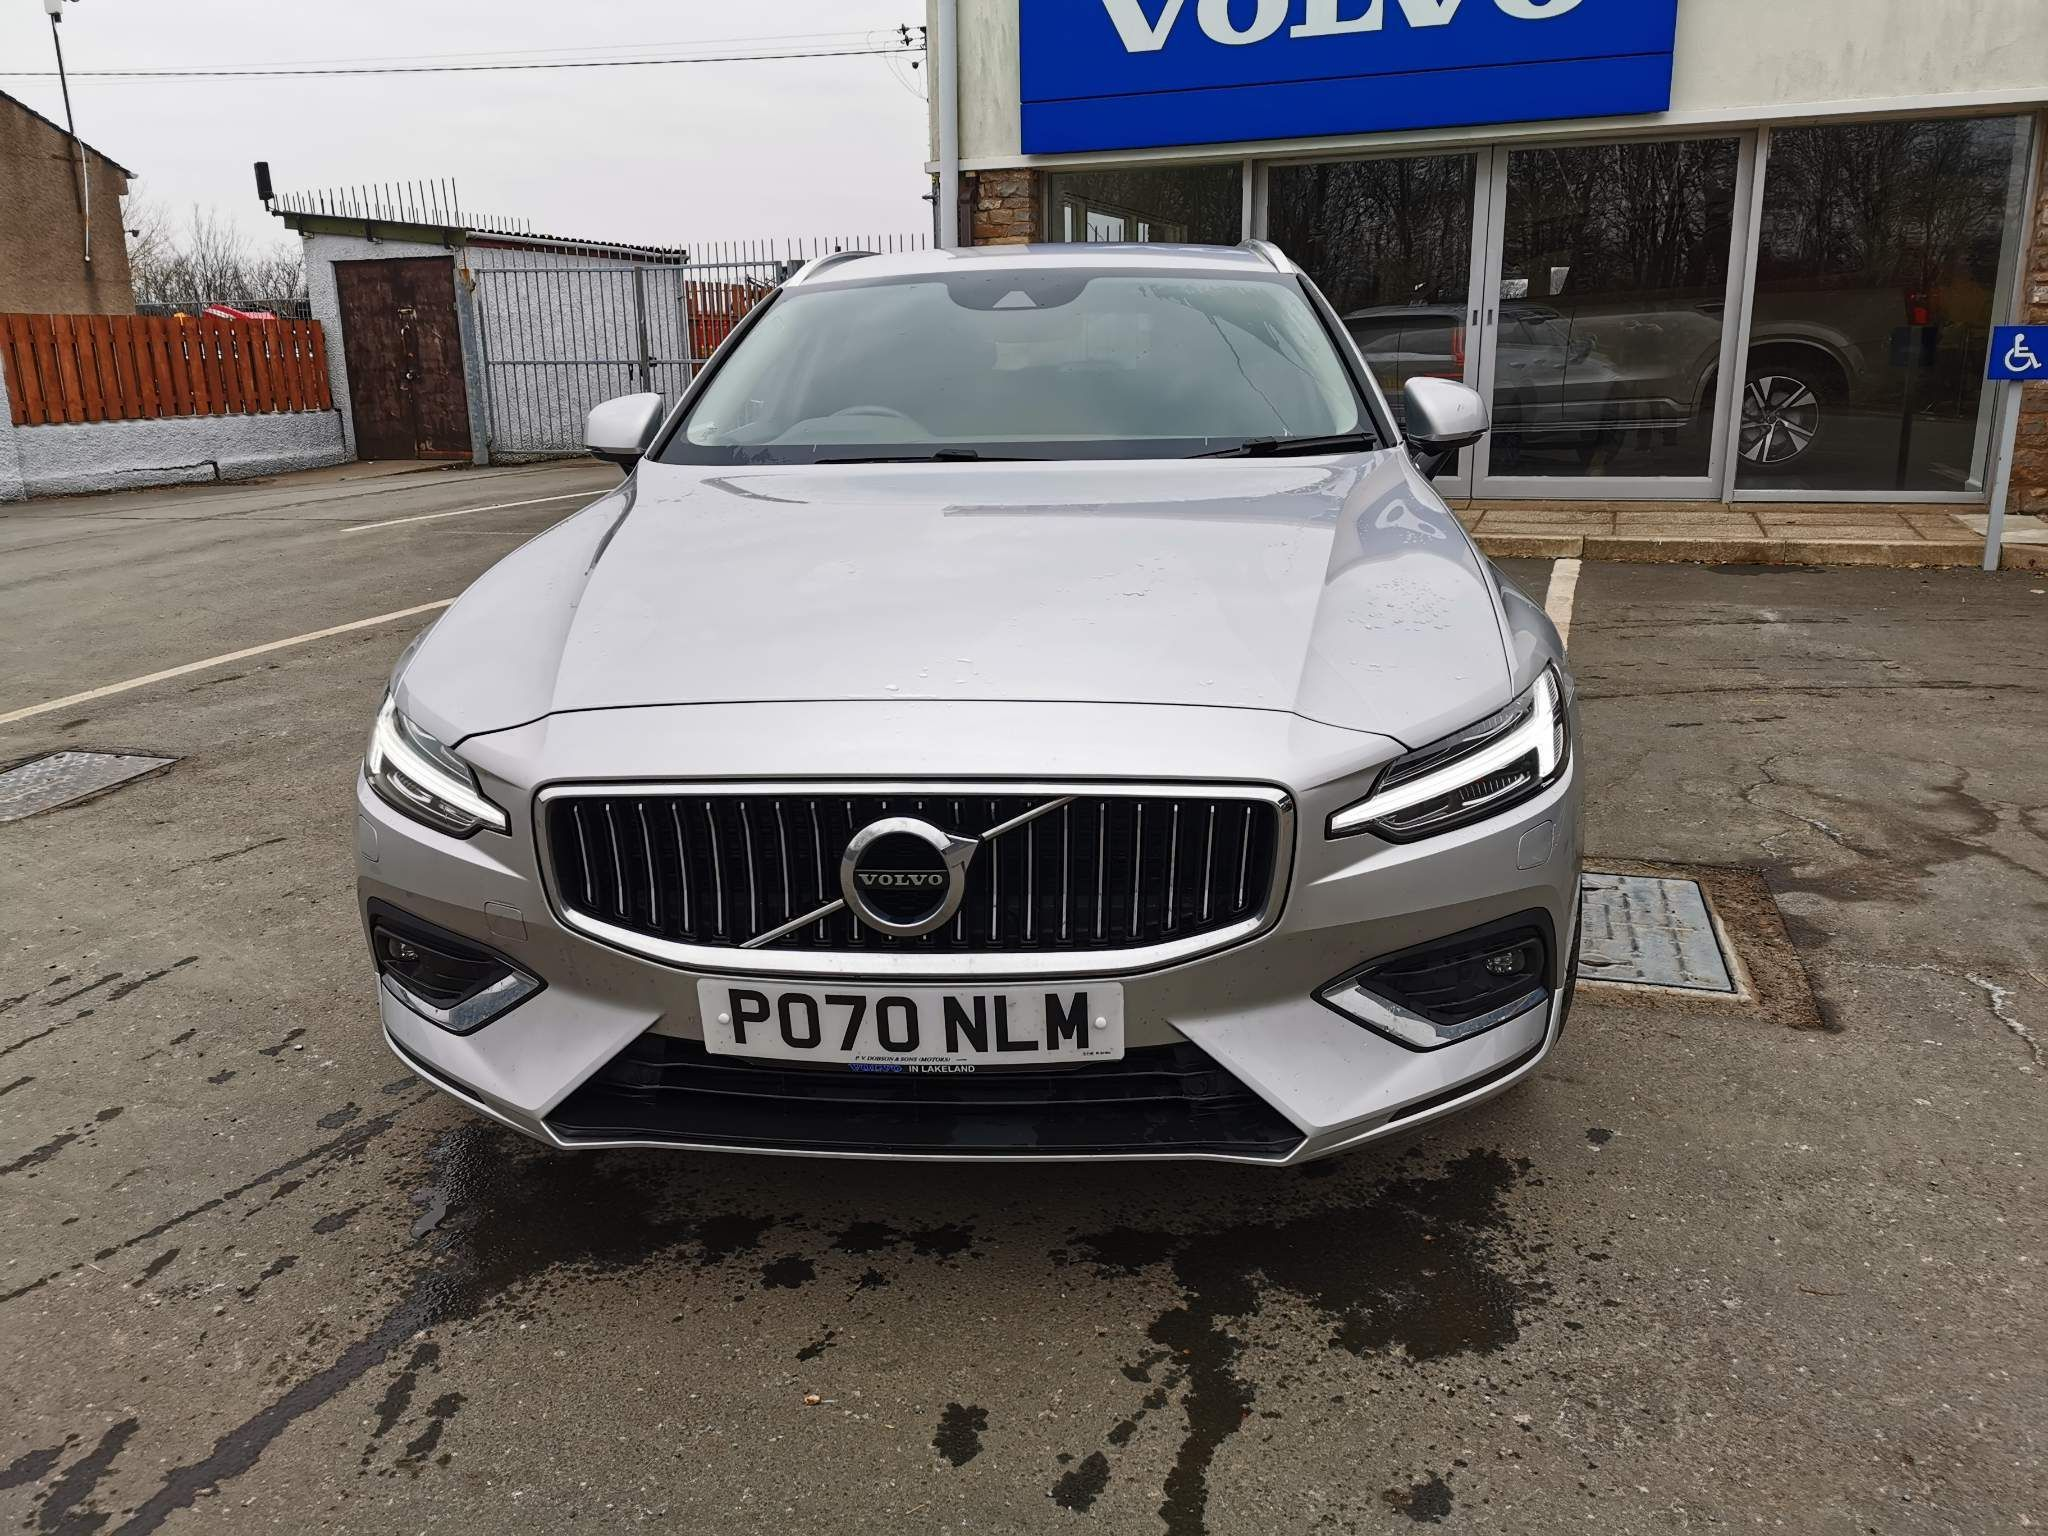 Volvo V60 2.0 T4 Inscription Plus Auto (s/s) 5dr